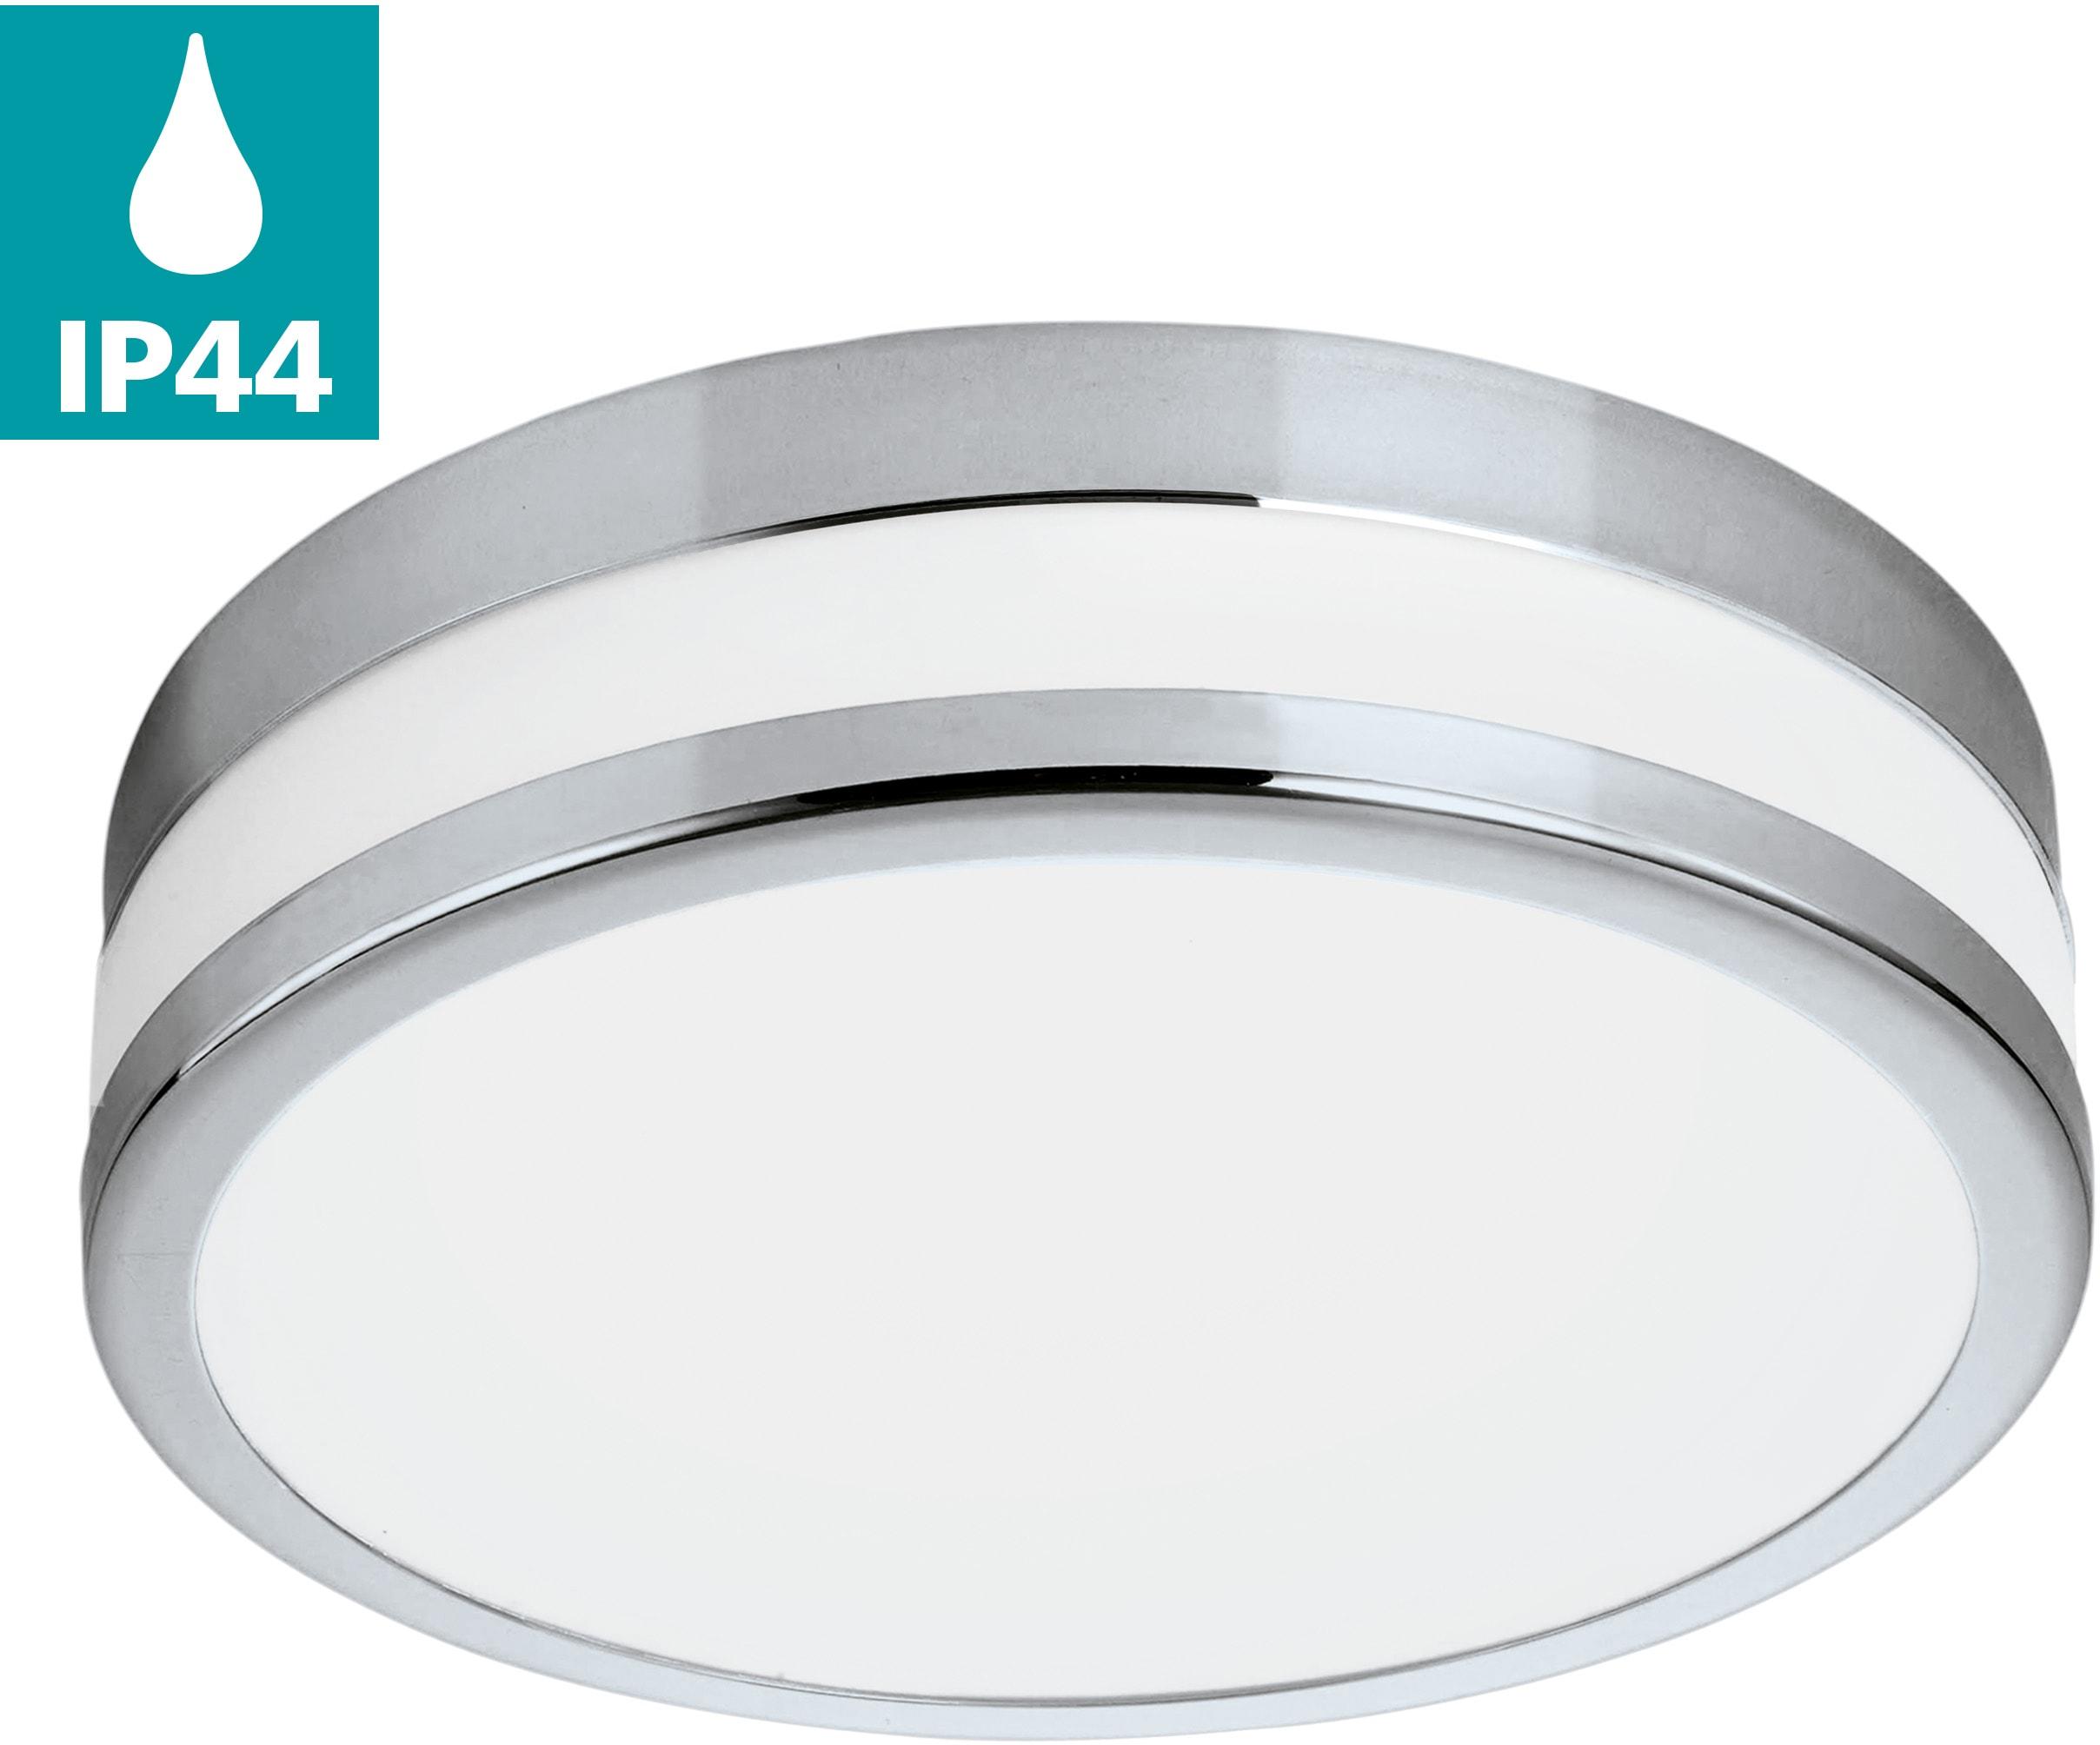 EGLO LED Deckenleuchte PALERMO, LED-Board, Warmweiß, LED fest integriert